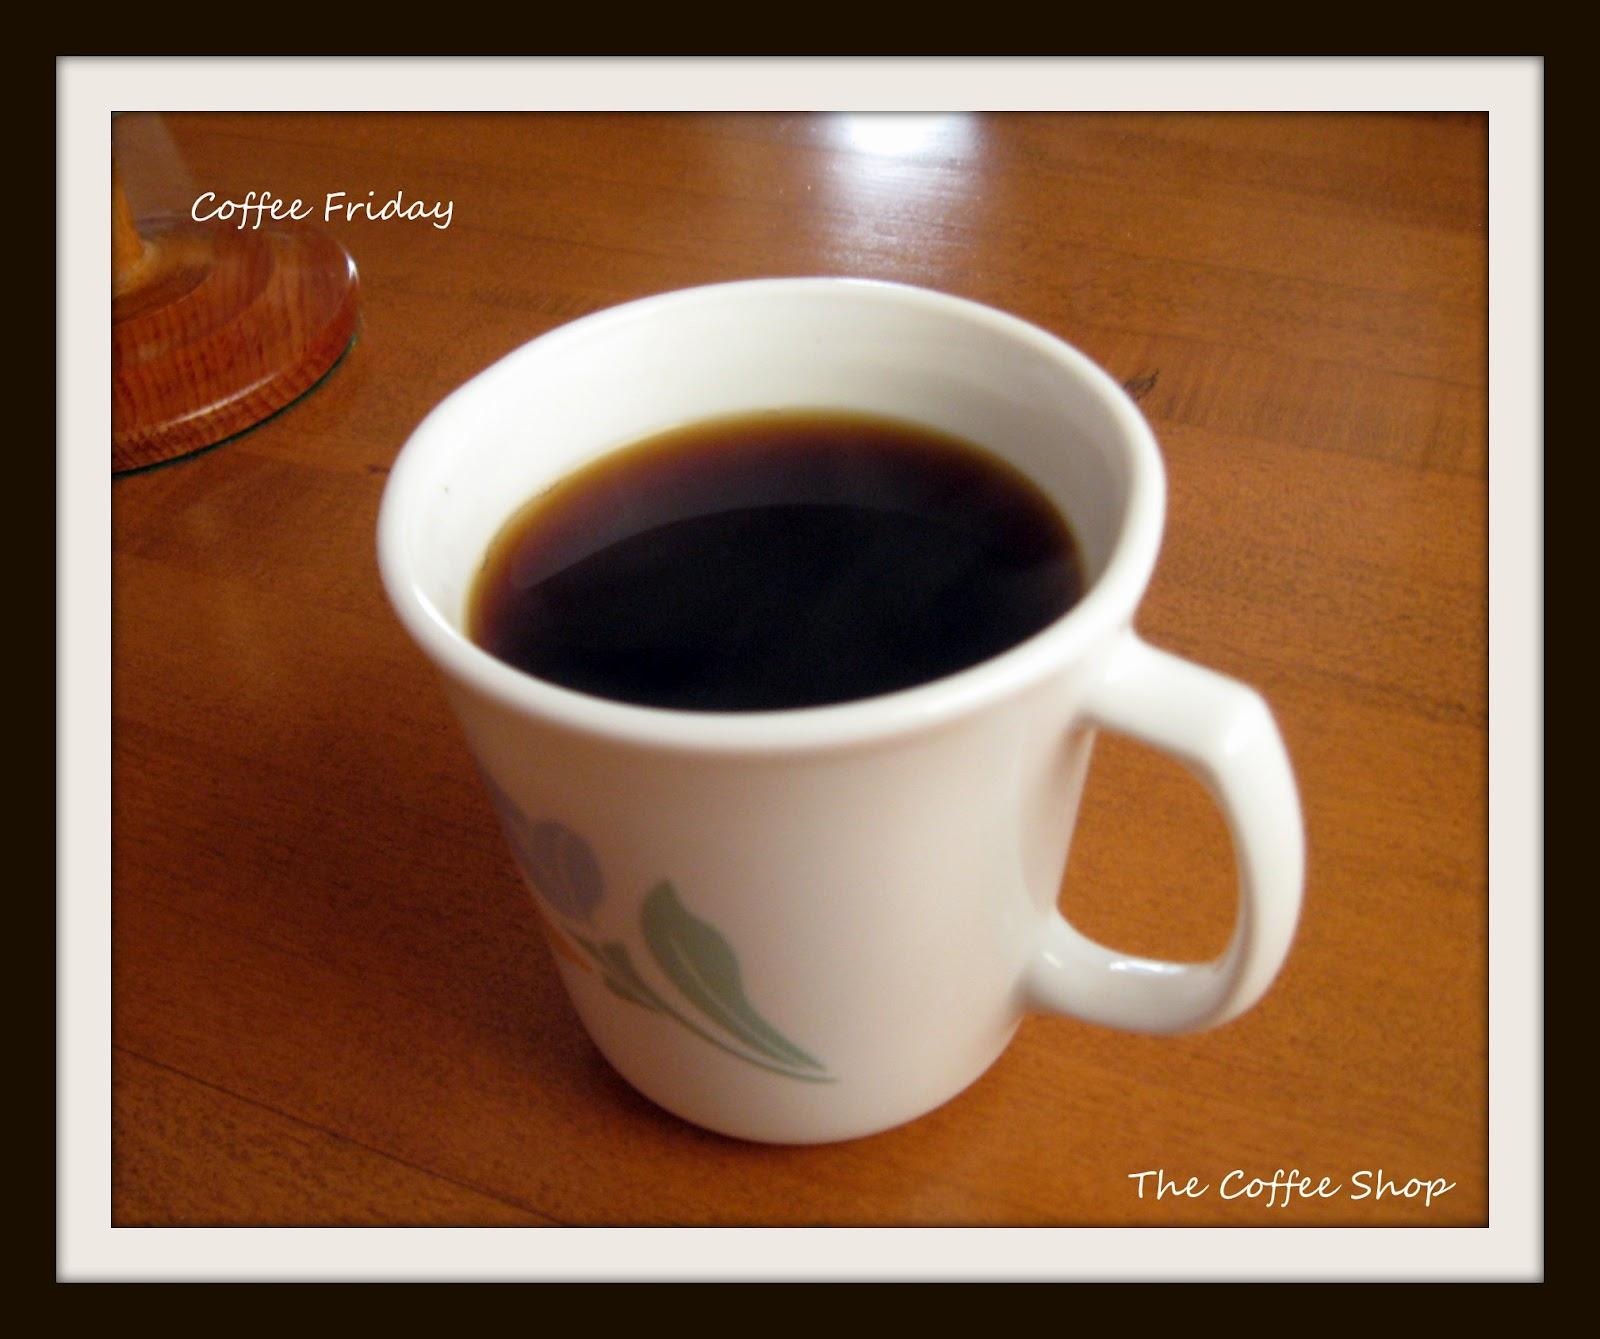 Best Coffee Mugs The Coffee Shop Coffee Friday